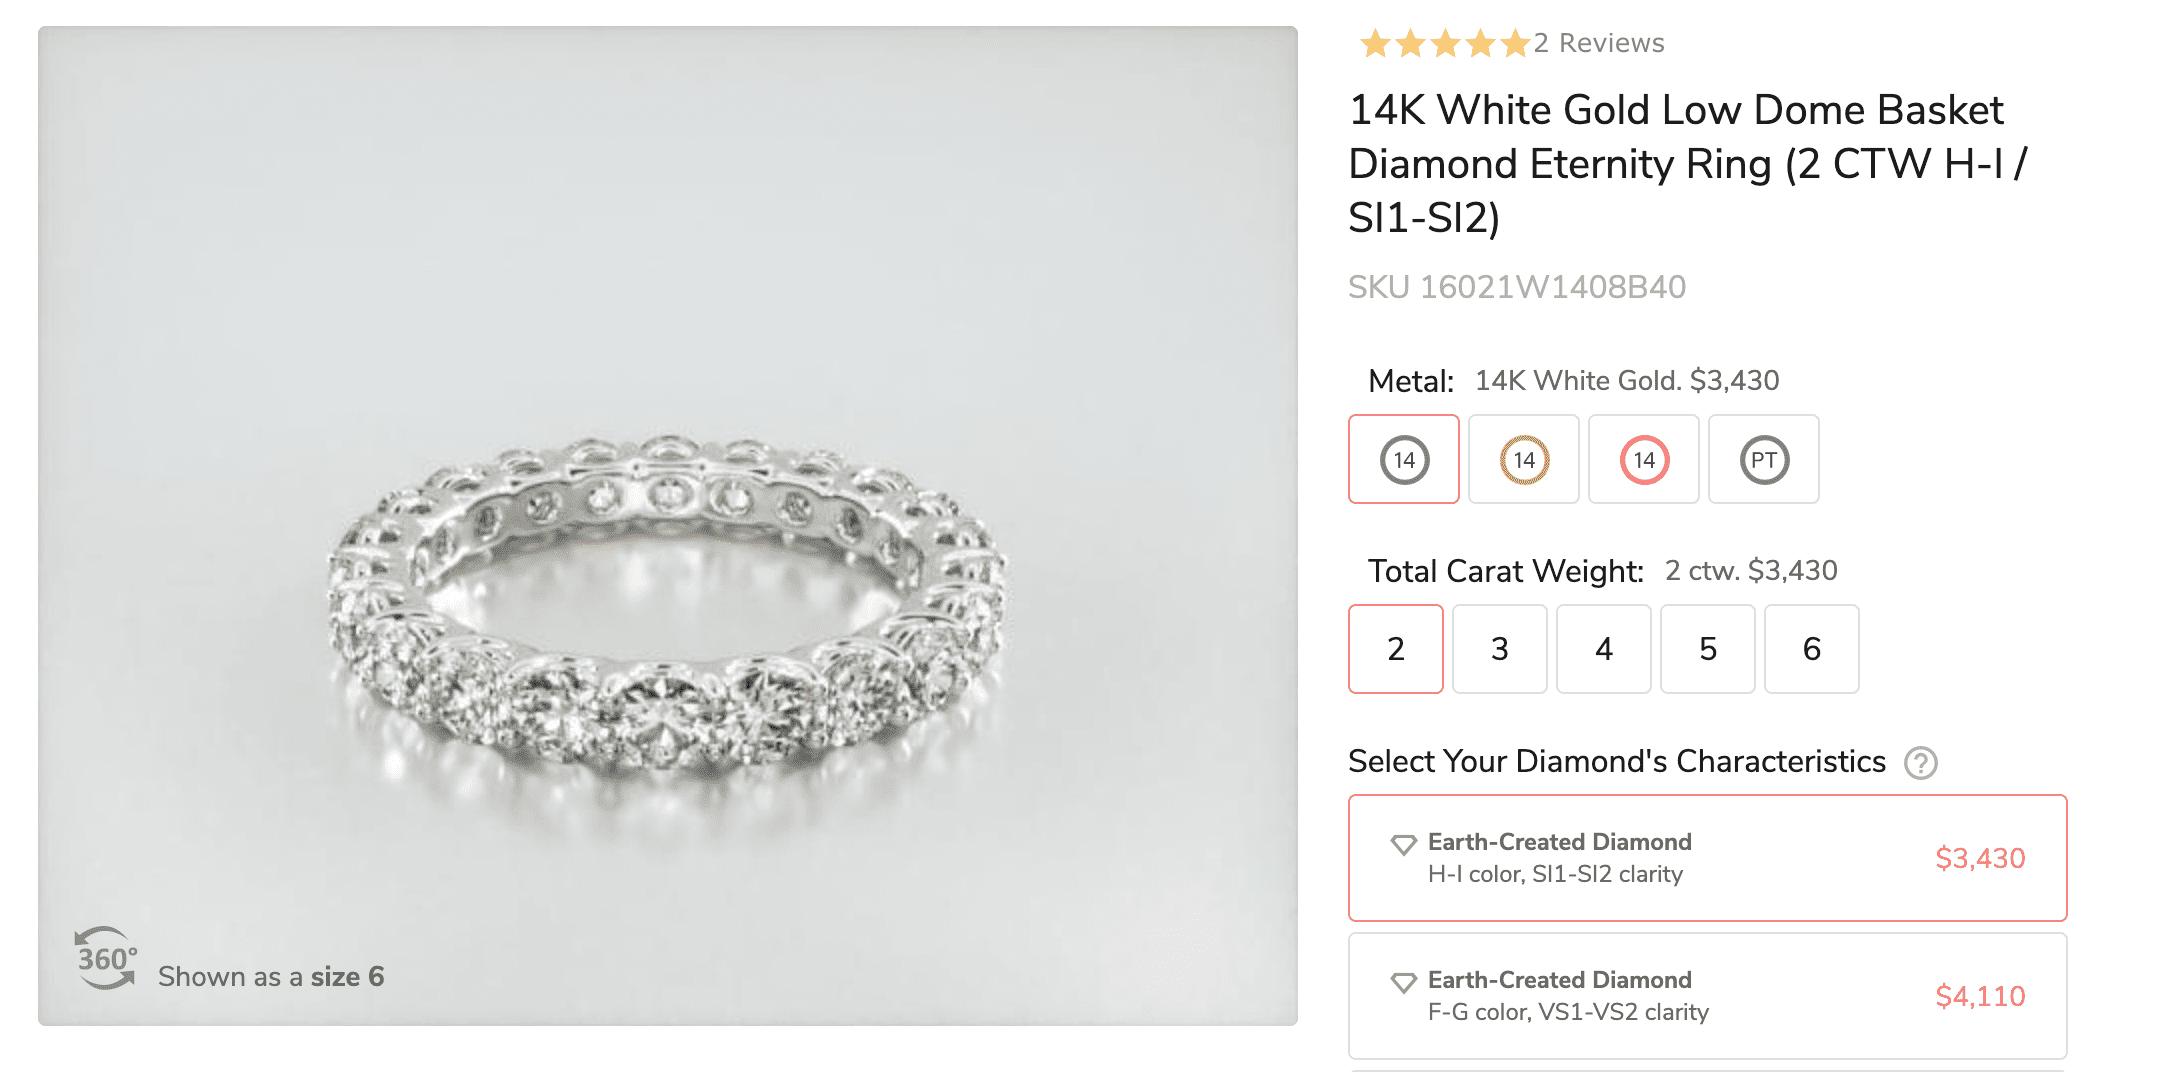 14K White Gold Low Dome Basket Diamond eternity Ring